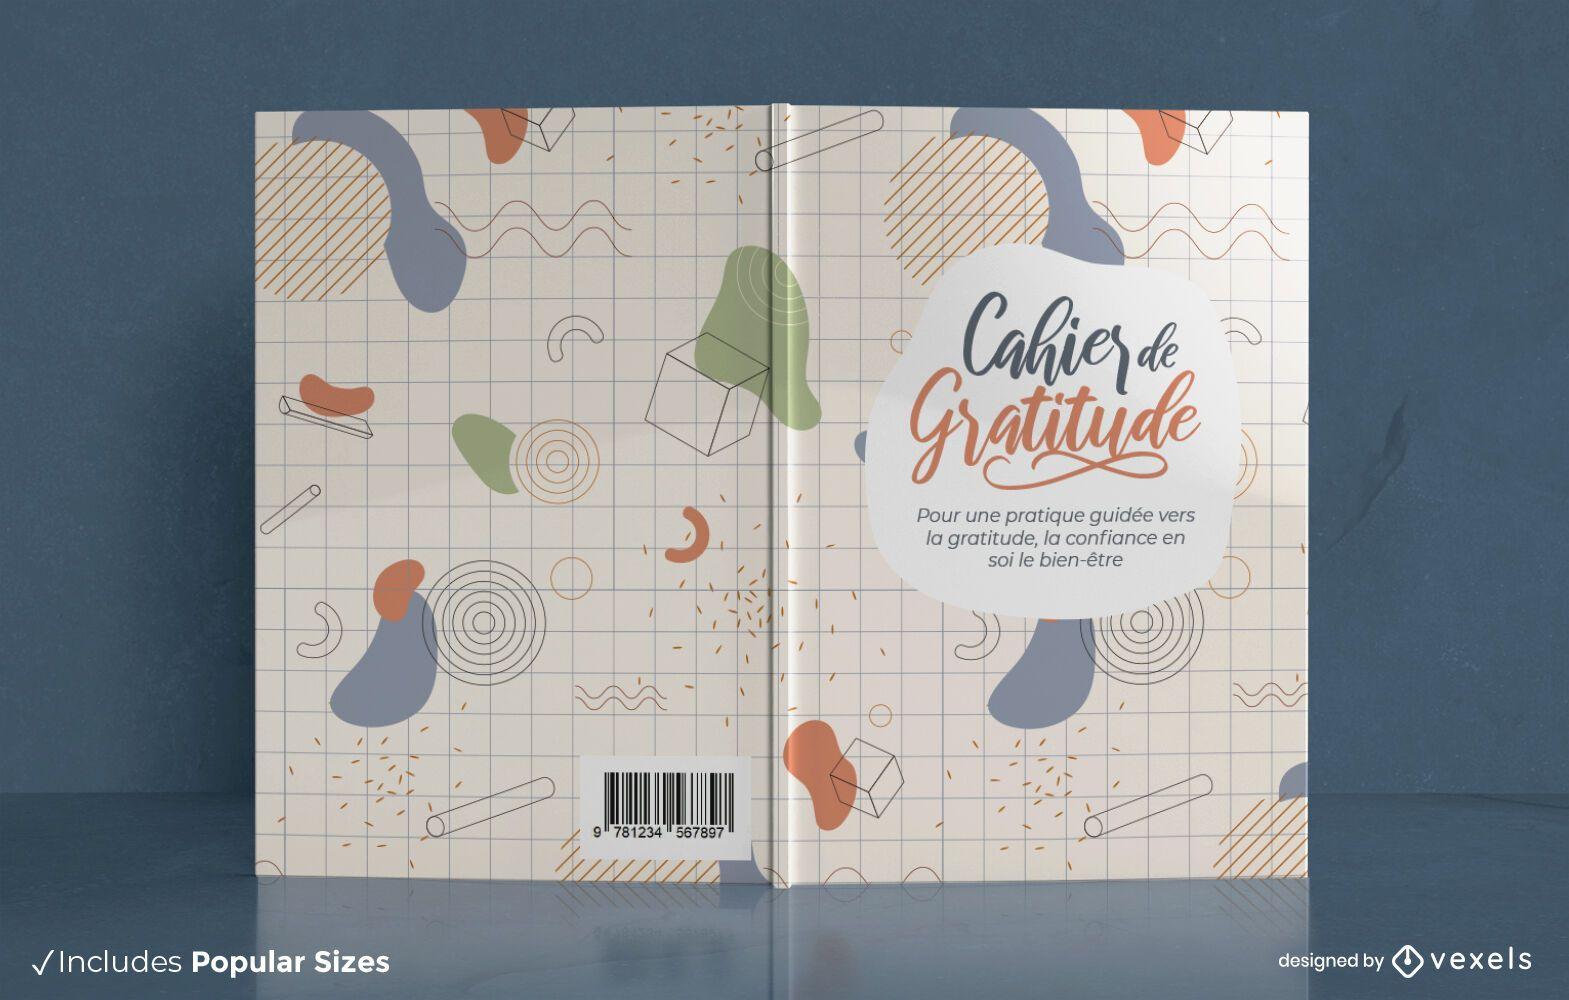 Cahier de gratitude book cover design